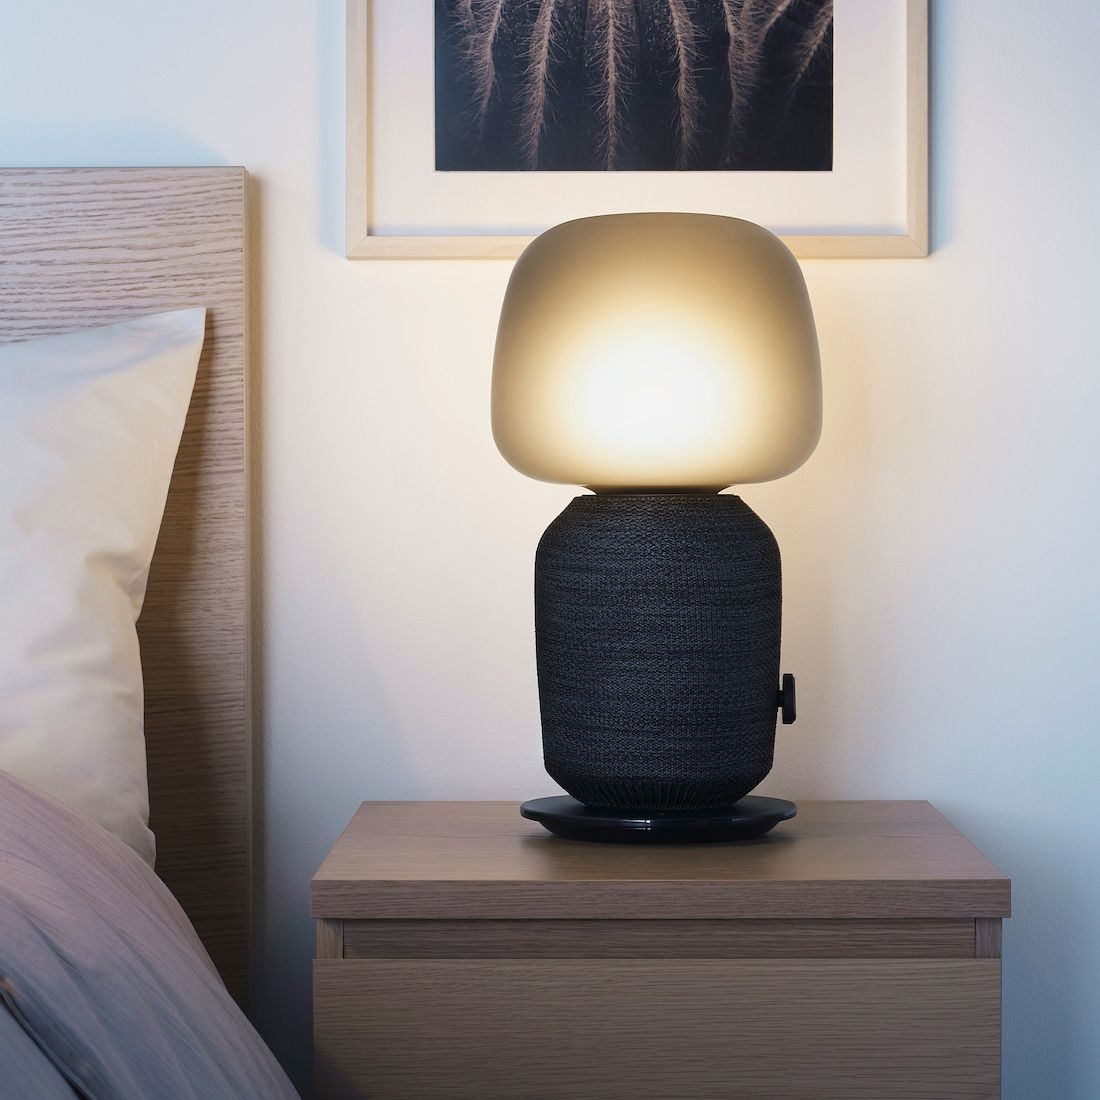 Symfonisk Bordslampa Med Wifi Hogtalare Svart Ikea Table Lamp Wifi Speakers Lamp